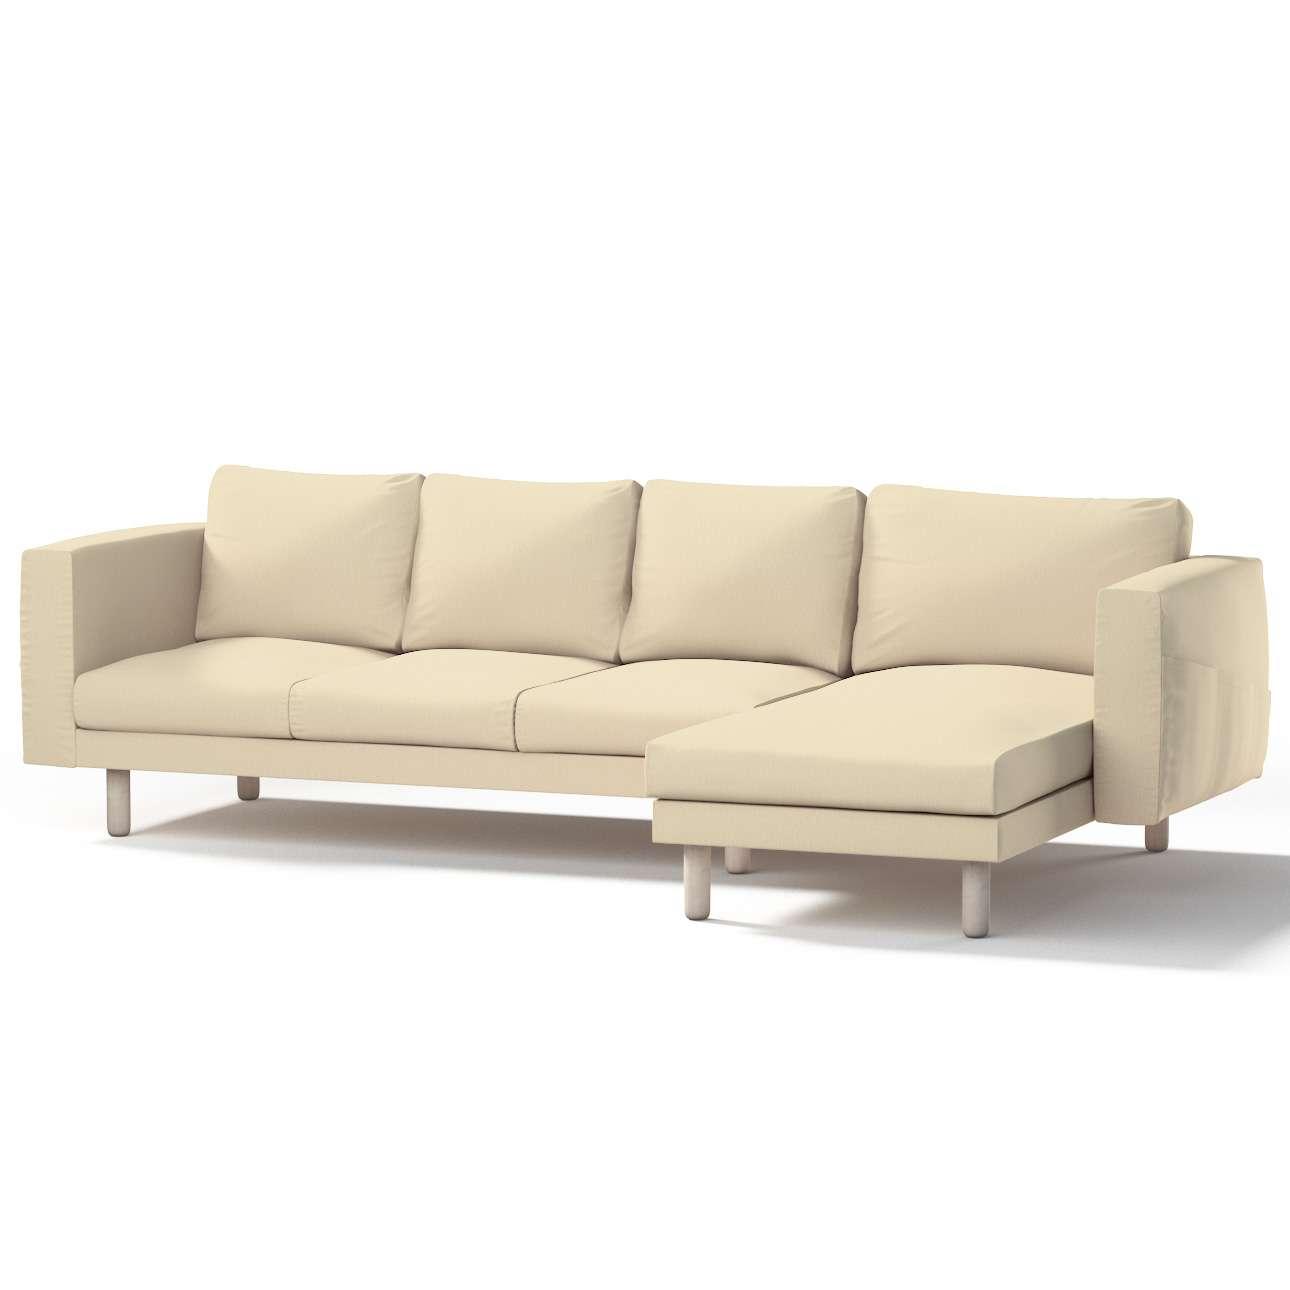 Norsborg bezug f r 4 sitzer sofa mit recamiere vanille for Sofa 4 sitzer